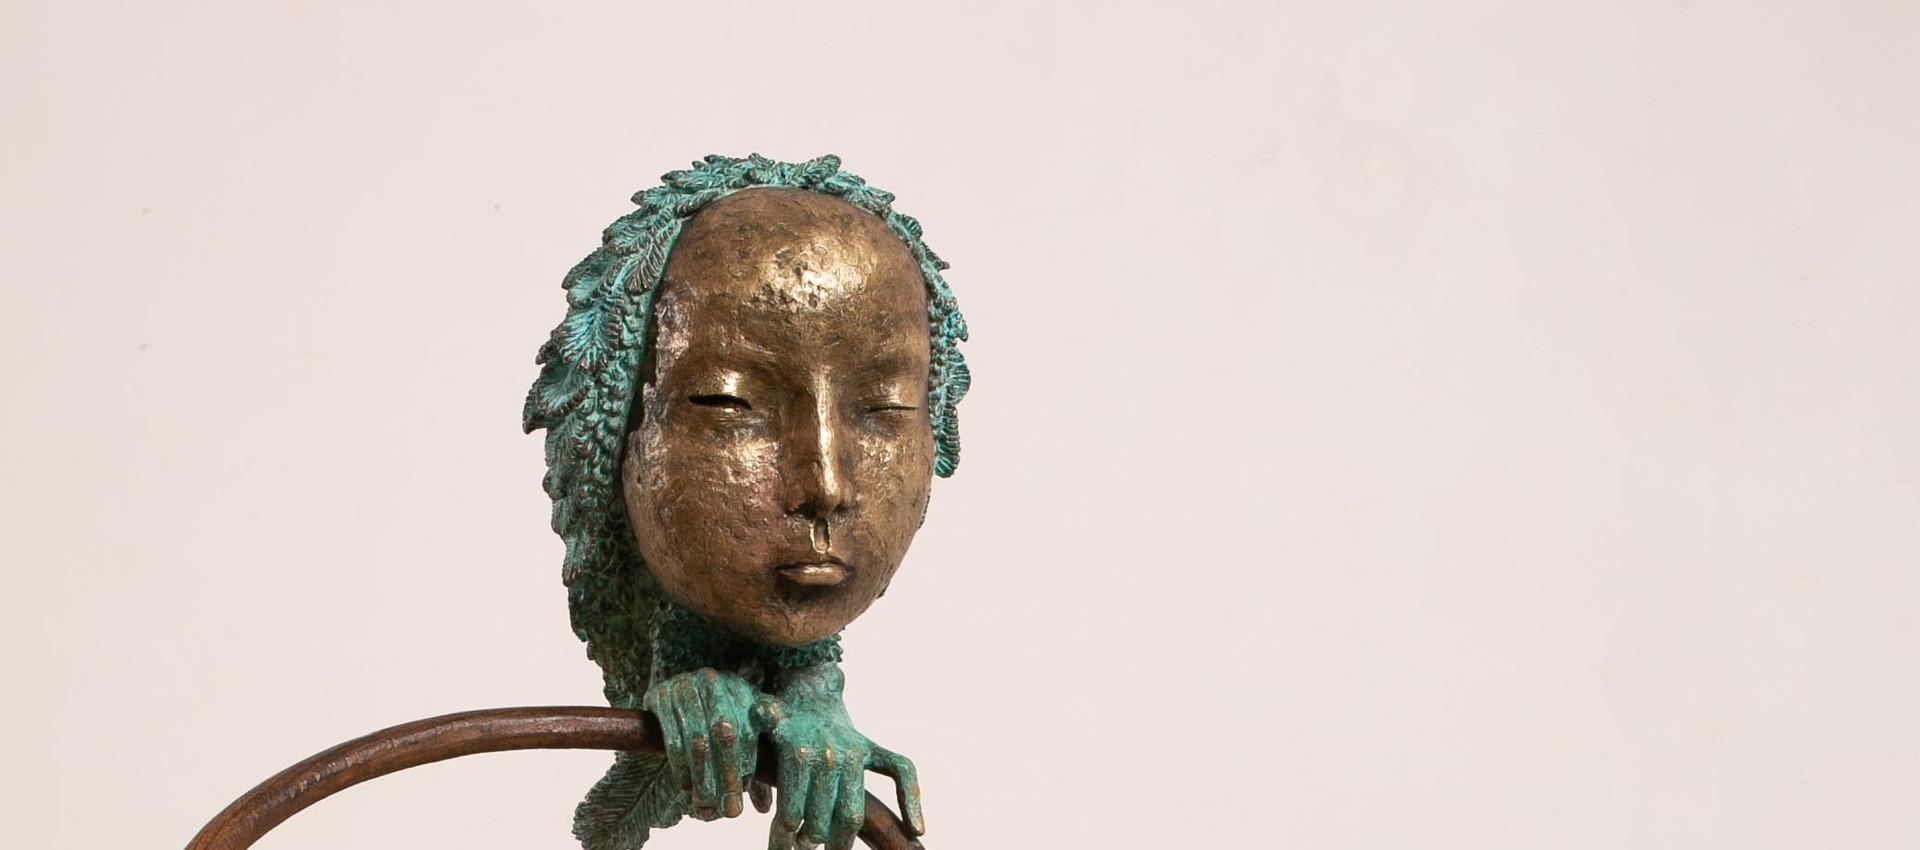 Alina Bachurina. Gnossienne V, 2020, bronze, stone, Viennese chair, 115х40 cm